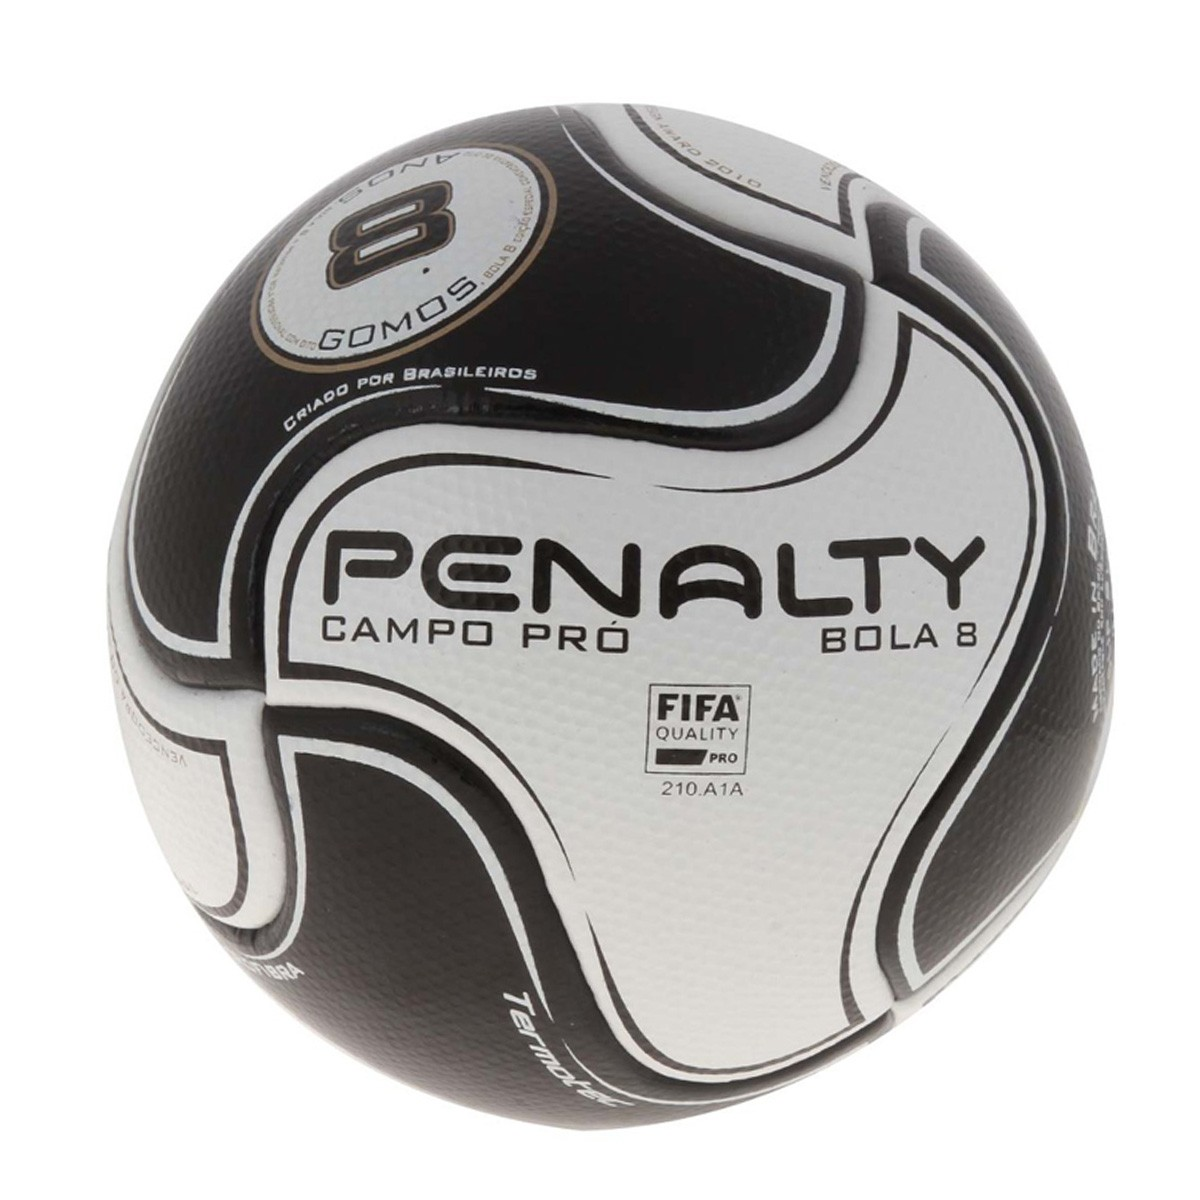 ce59b4a528 Bola S11 Pro VI Penalty Campo 541383-1110 - Branco Preto - Botas ...